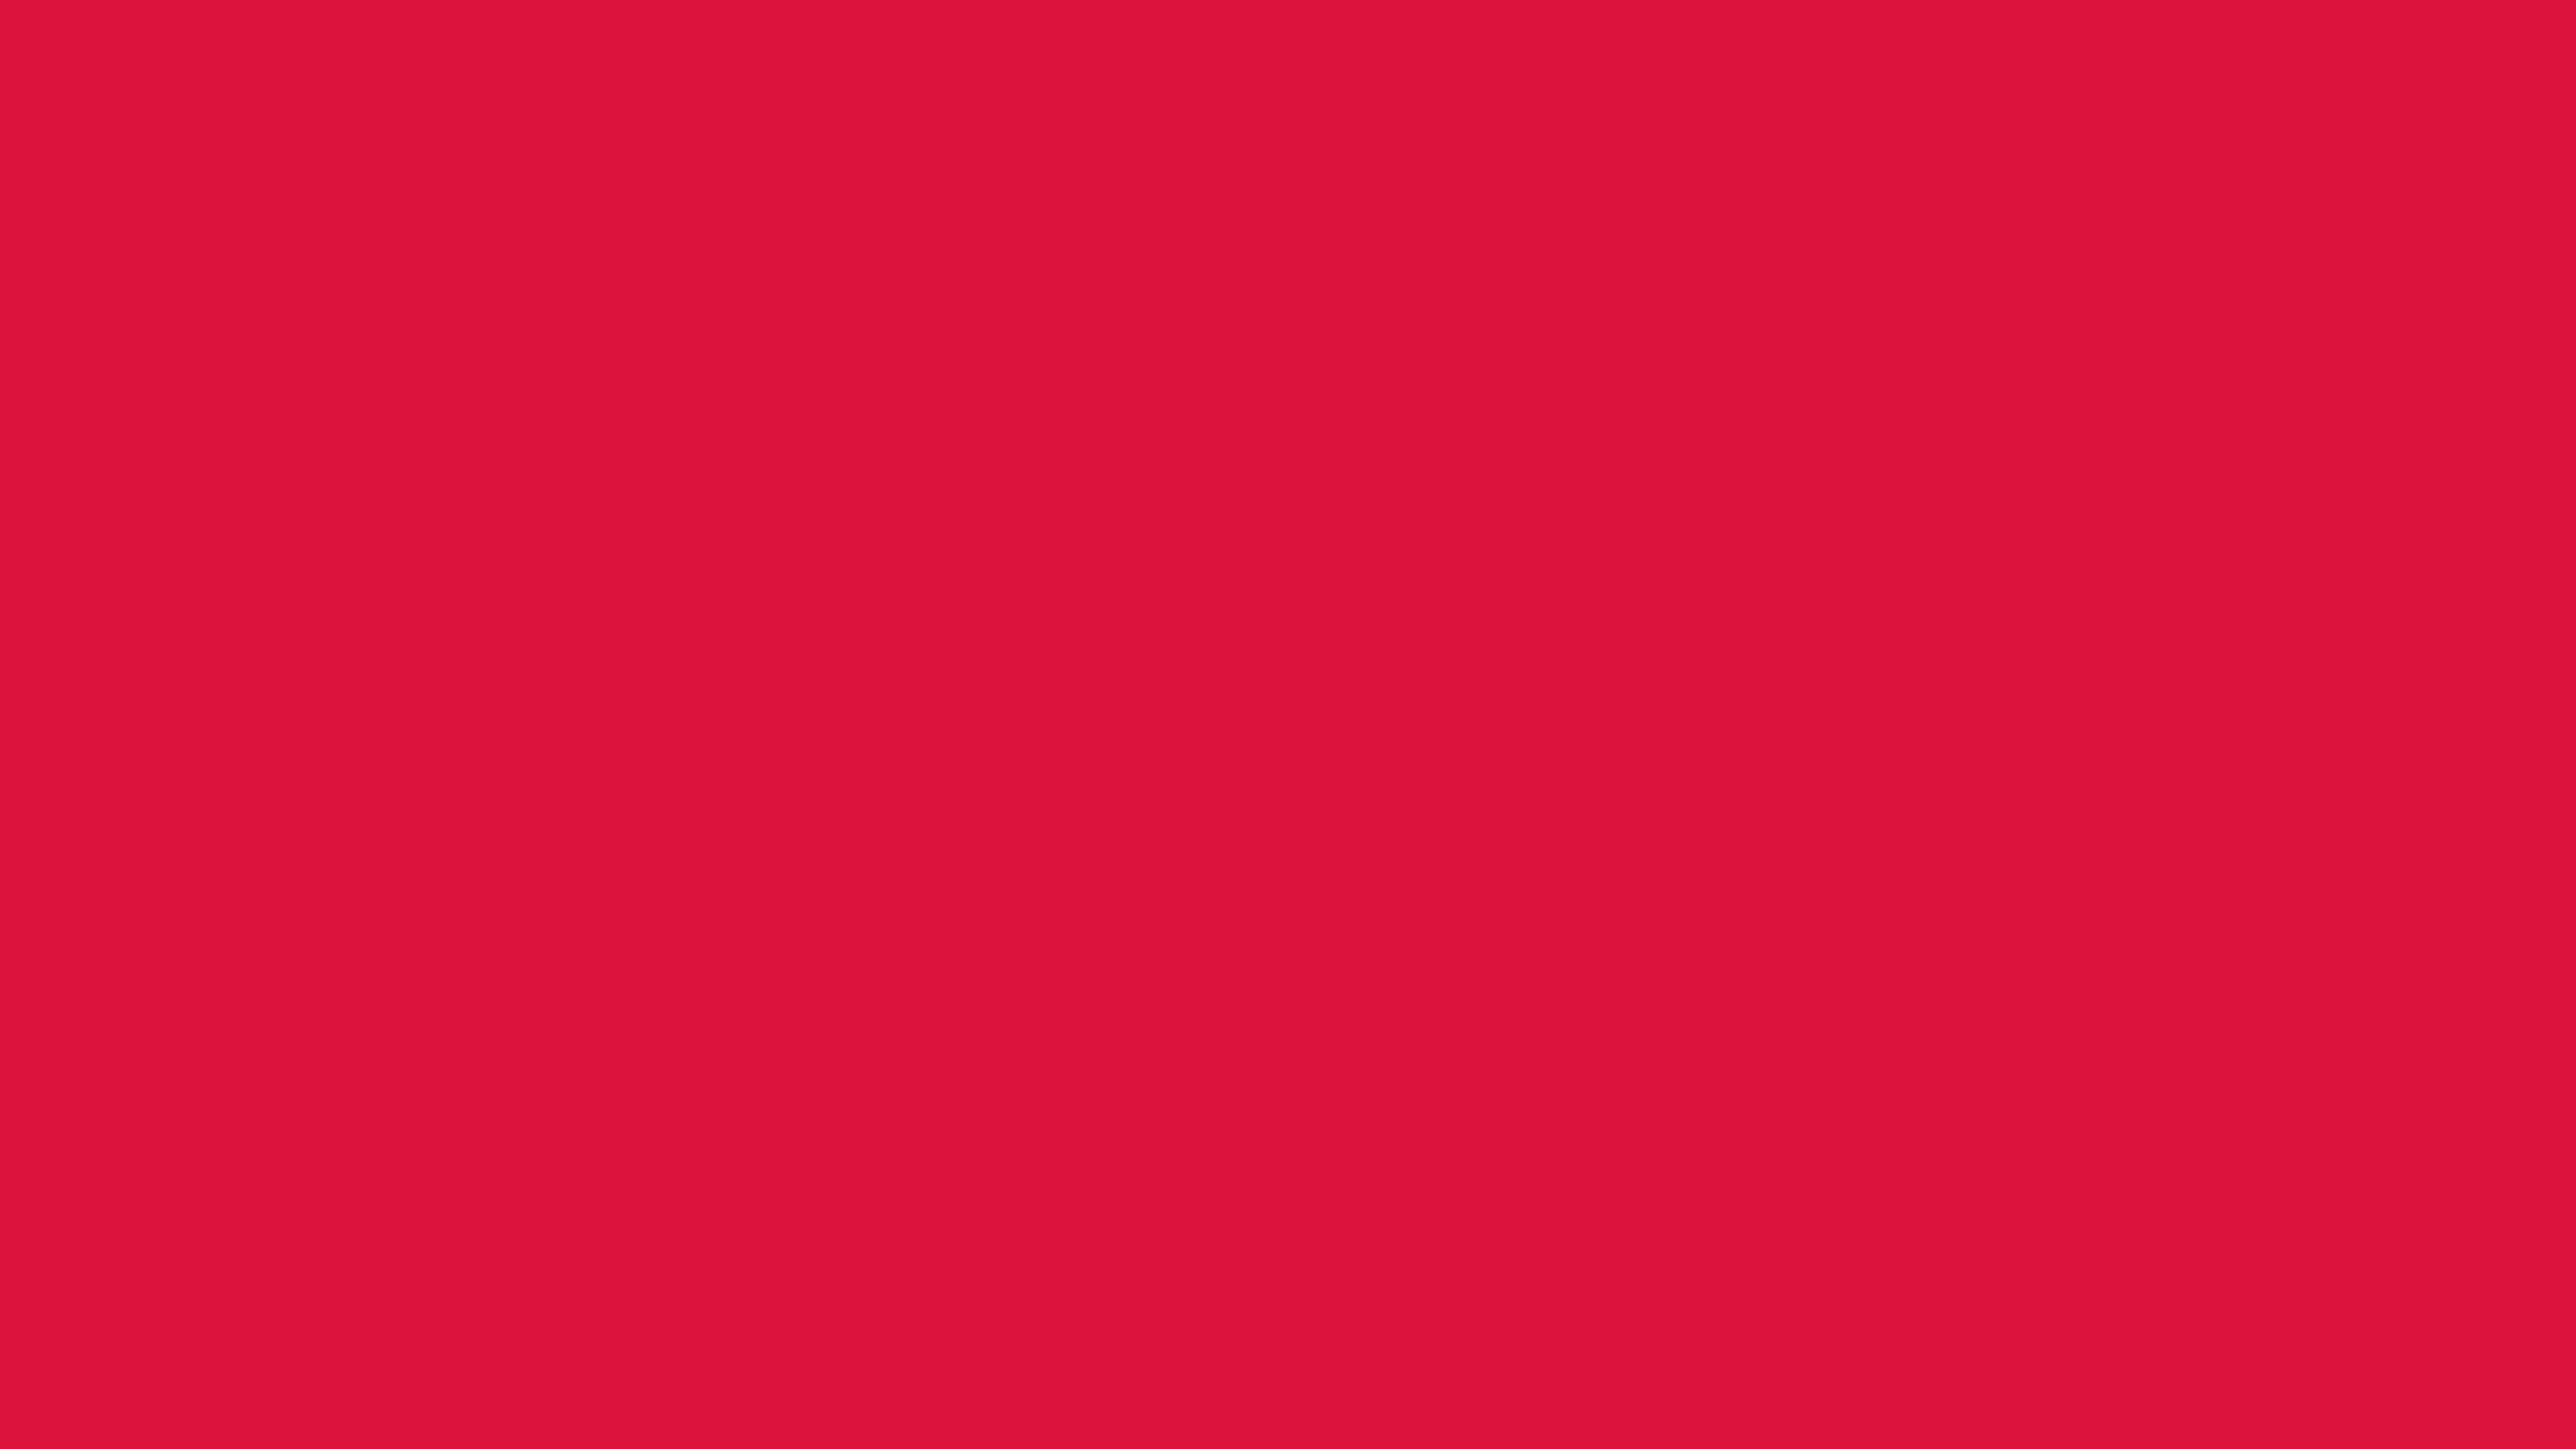 3840x2160 Crimson Solid Color Background